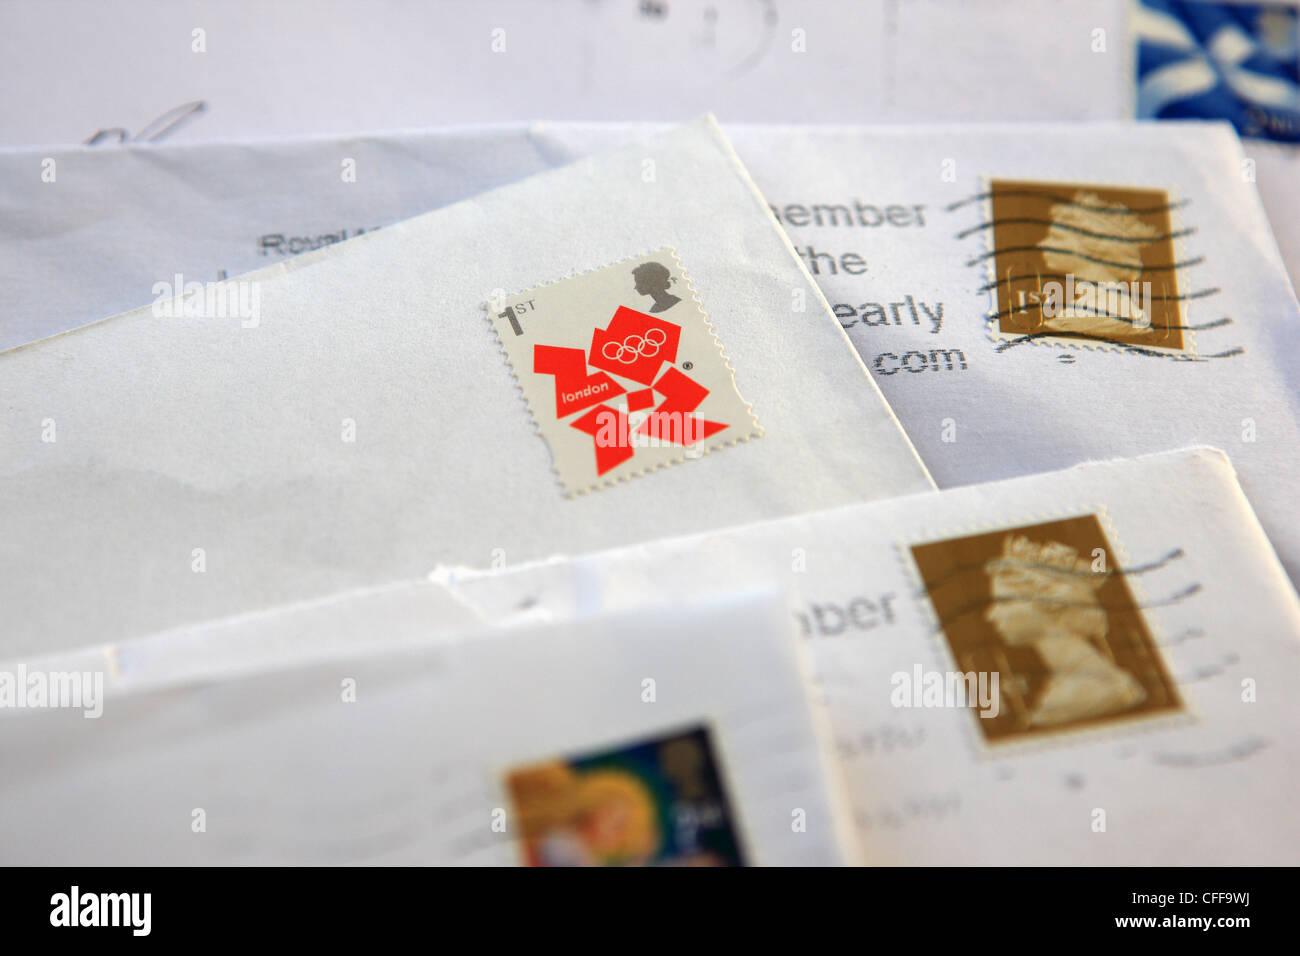 British stamps on envelopes - Stock Image